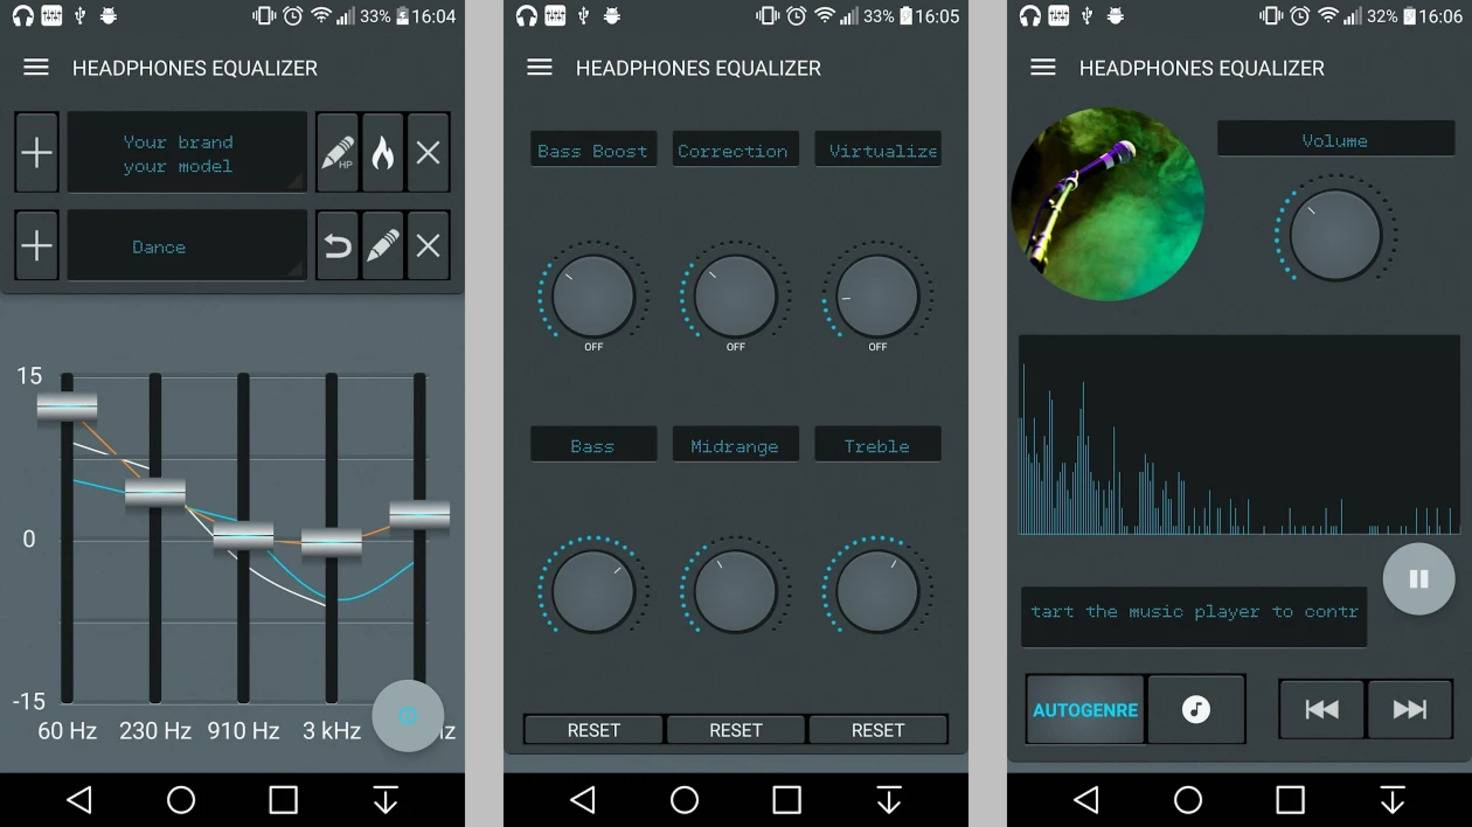 headphones-equalizer-app